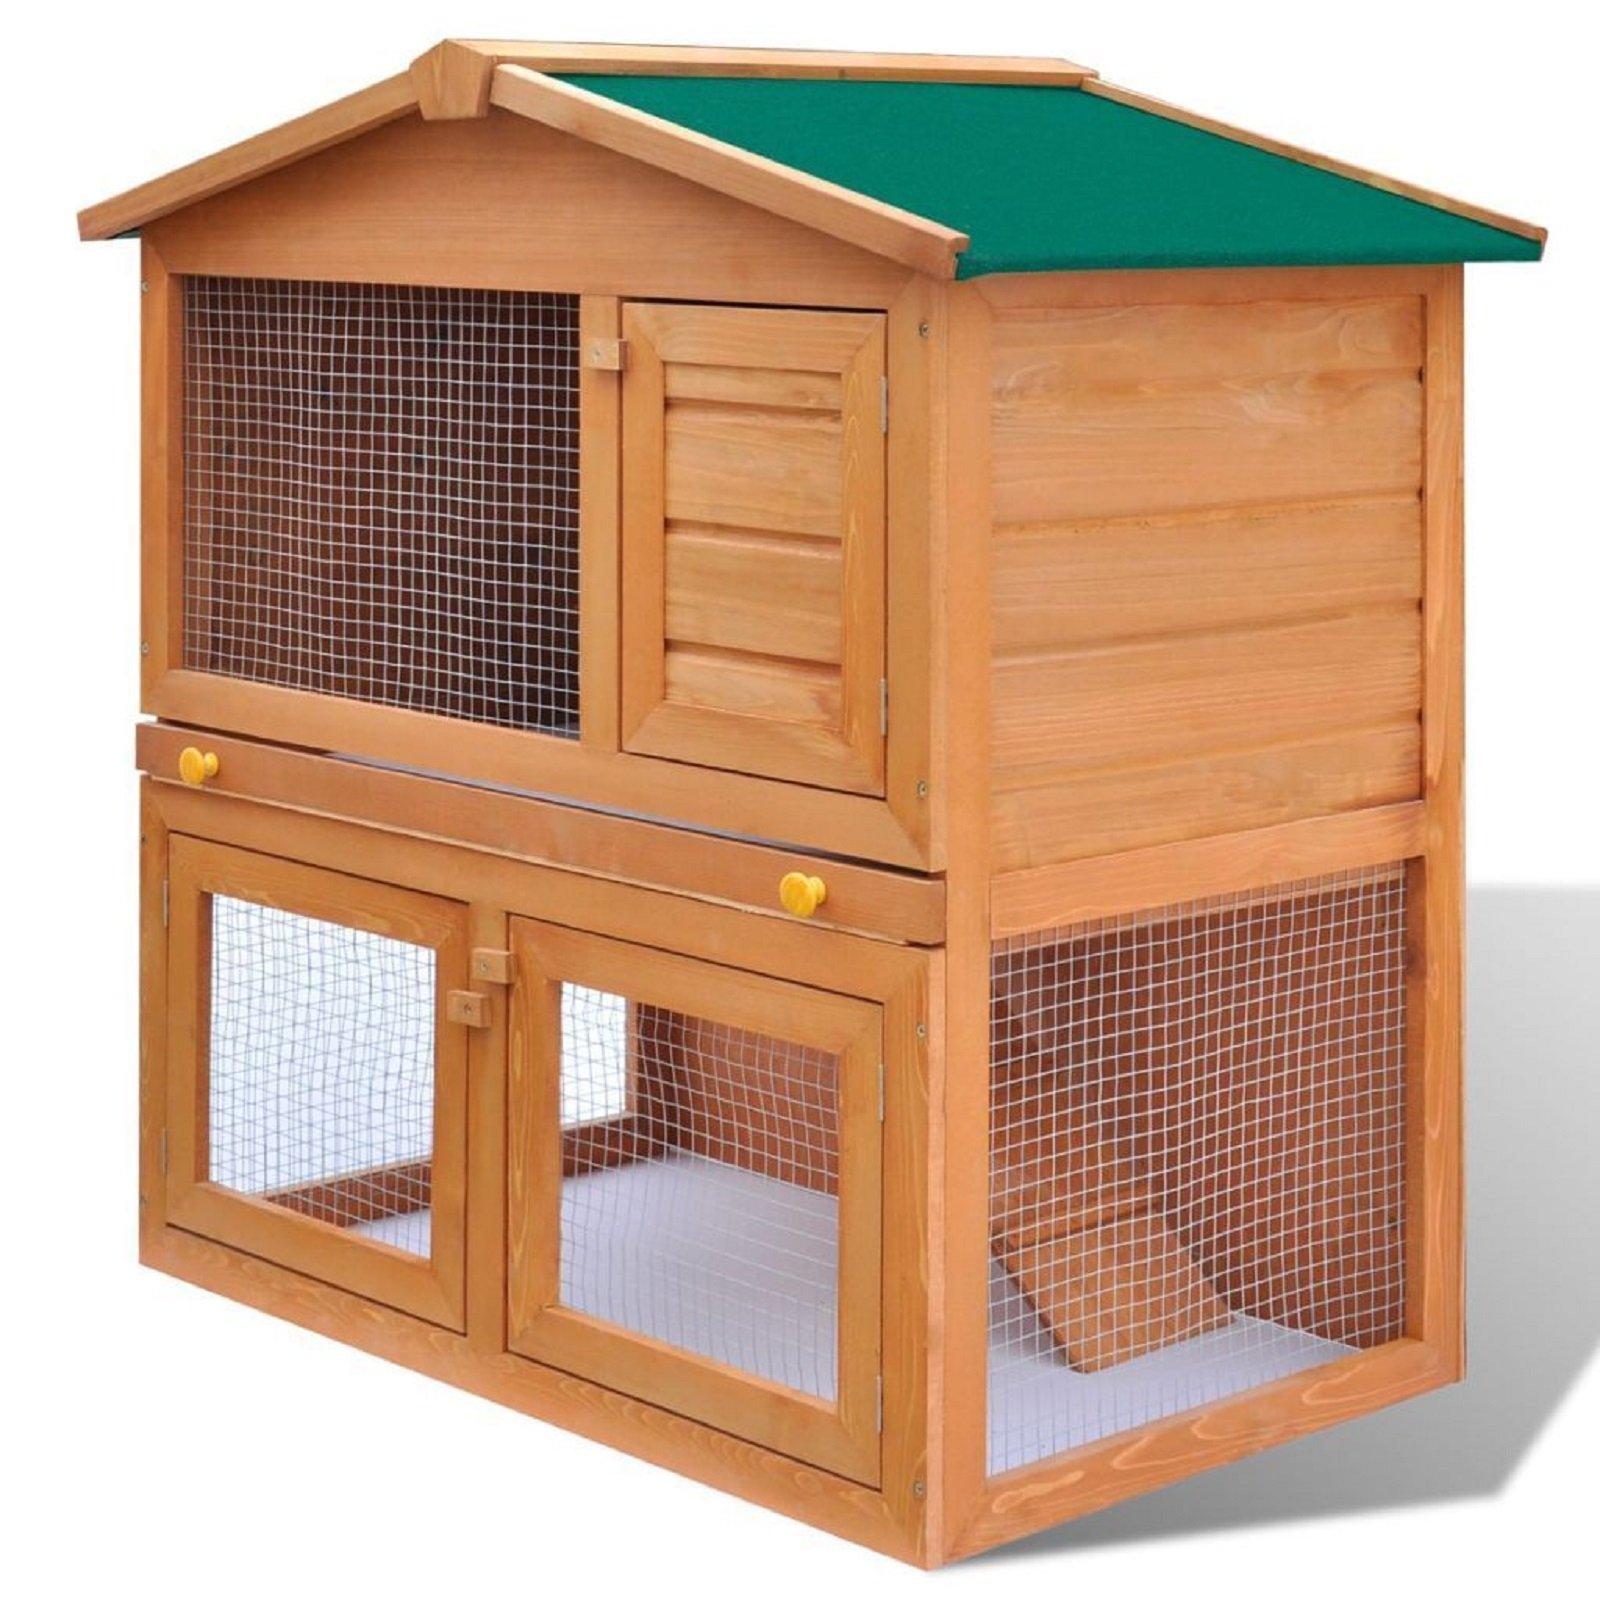 HOT! Outdoor Rabbit Hutch Small Animal House Pet Wooden Cage Chicken Coop w/ 3 Doors